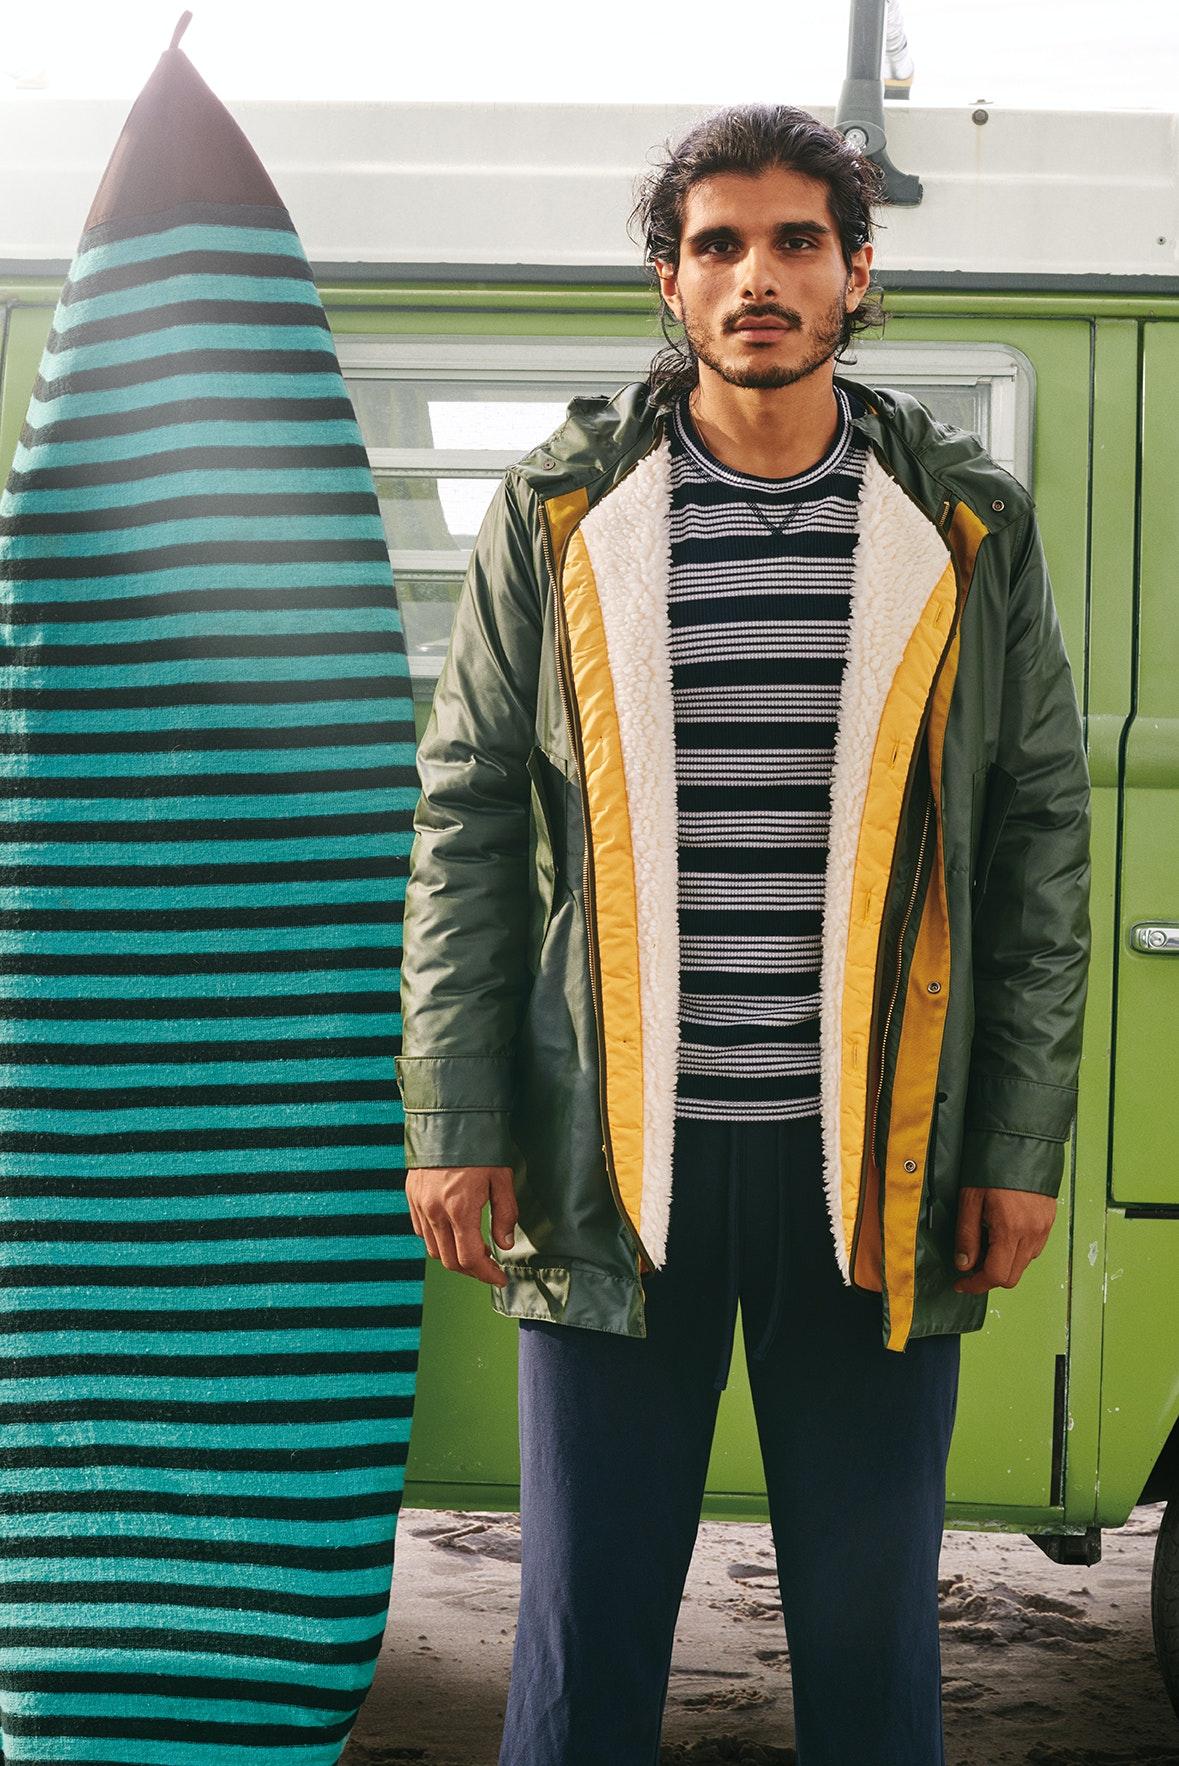 Man wearing The Fishtail Parka